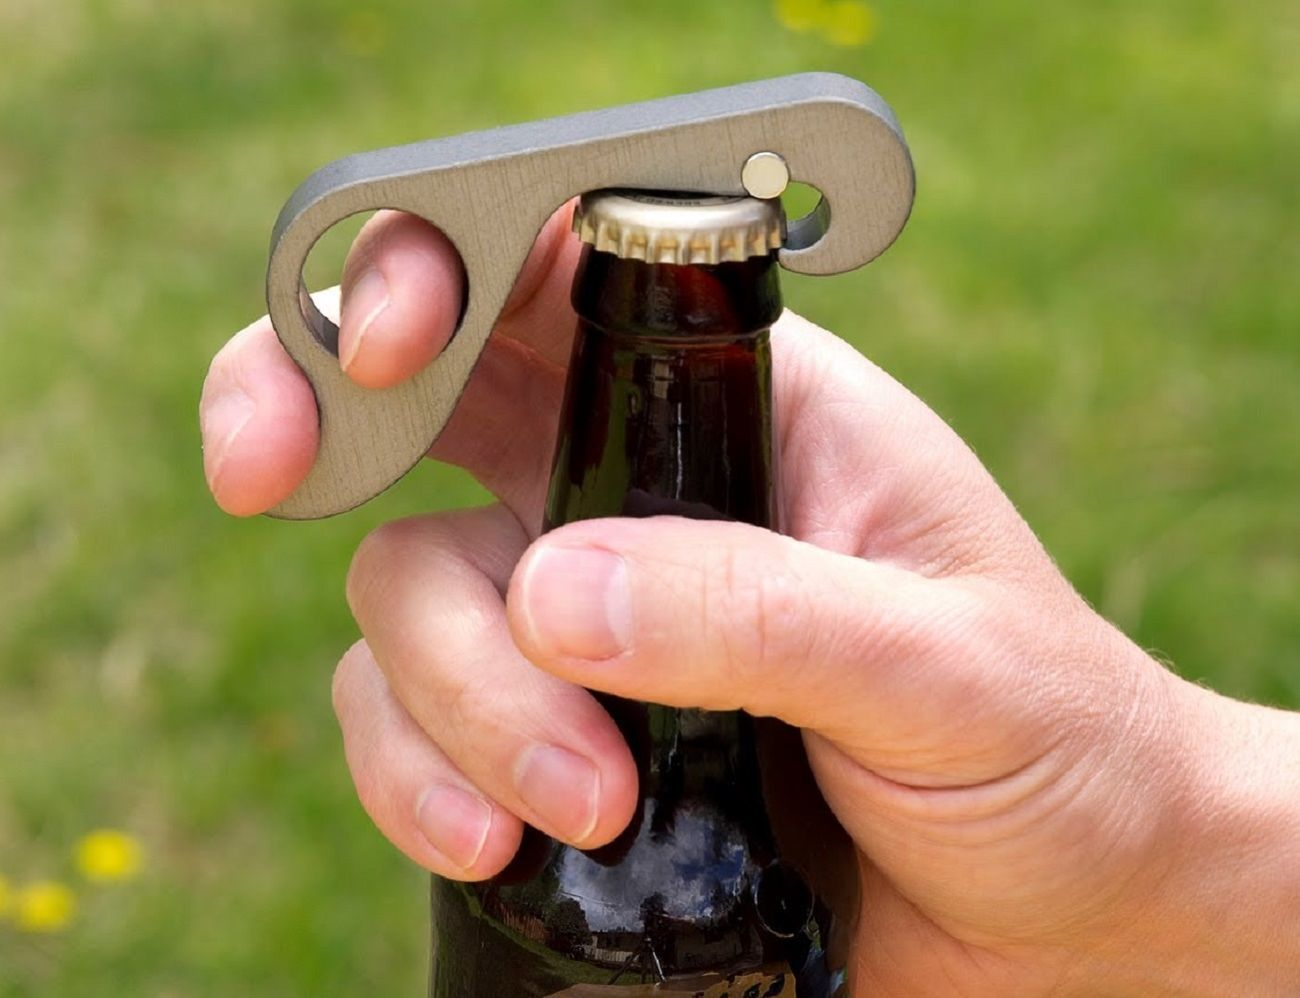 Grab Opener: The One-Handed Bottle Opener